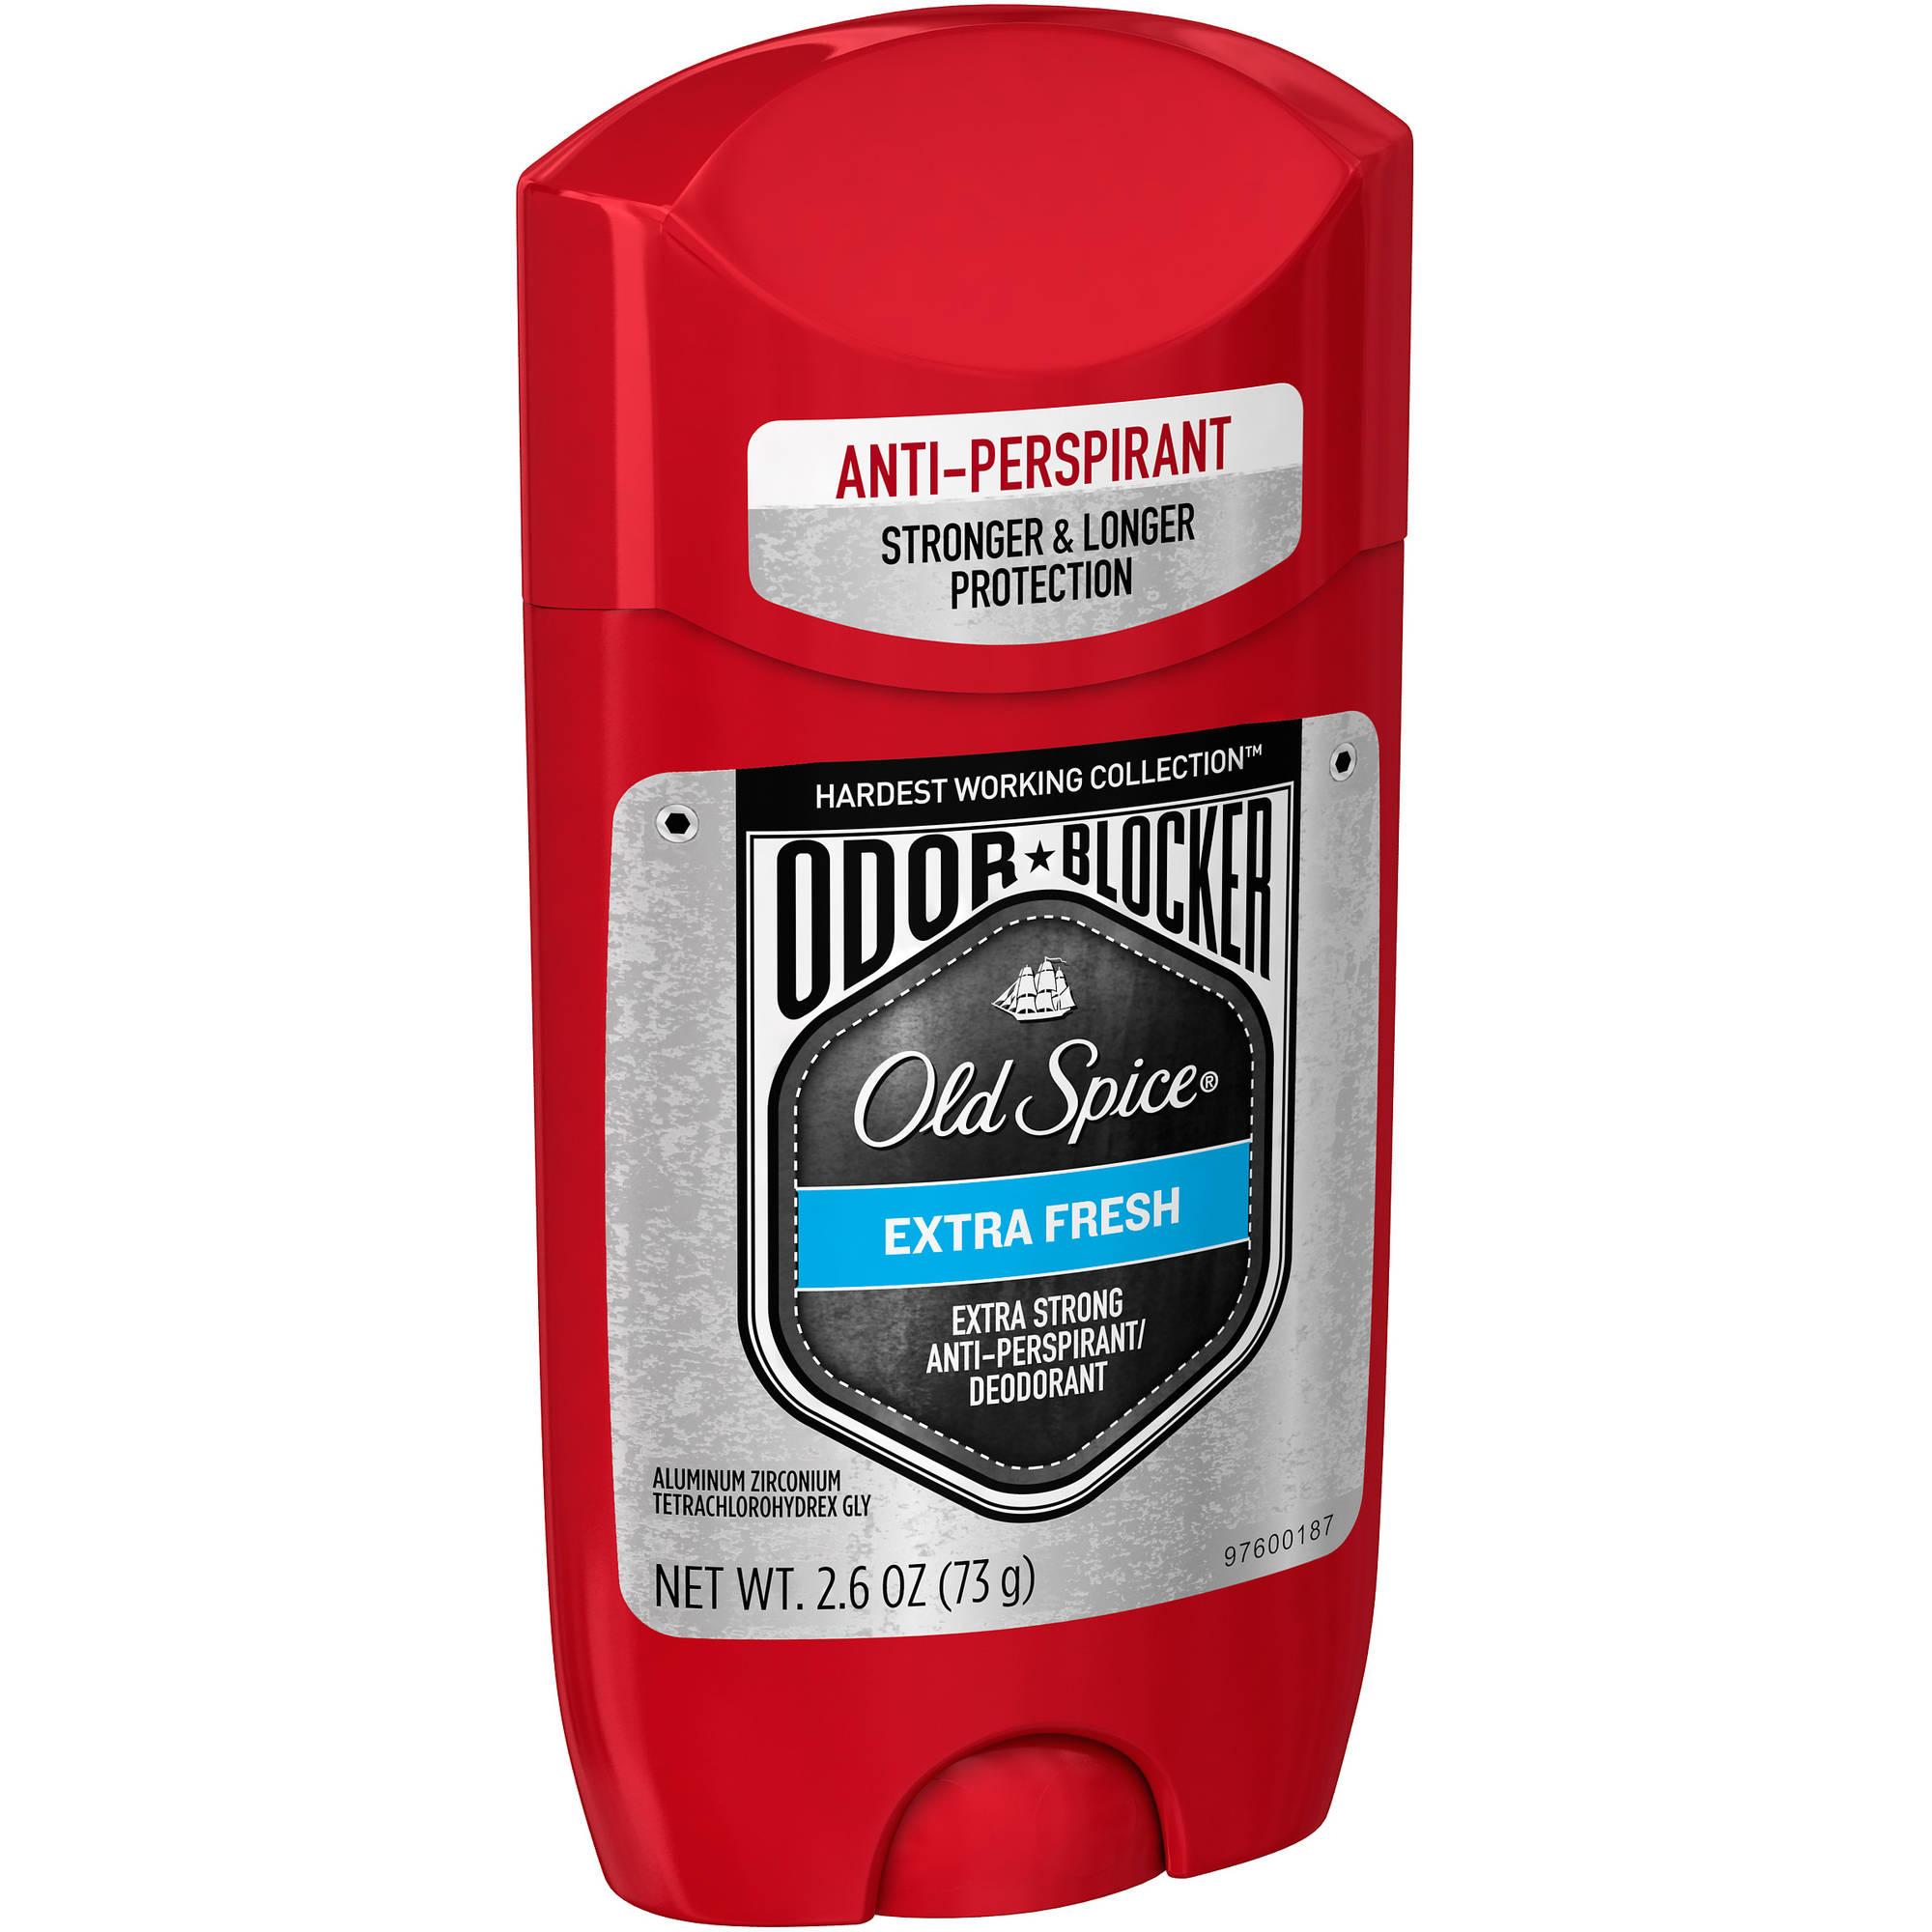 Old Spice Odor Blocker Extra Fresh Extra Strong Anti-Perspirant/Deodorant, 2.6 oz